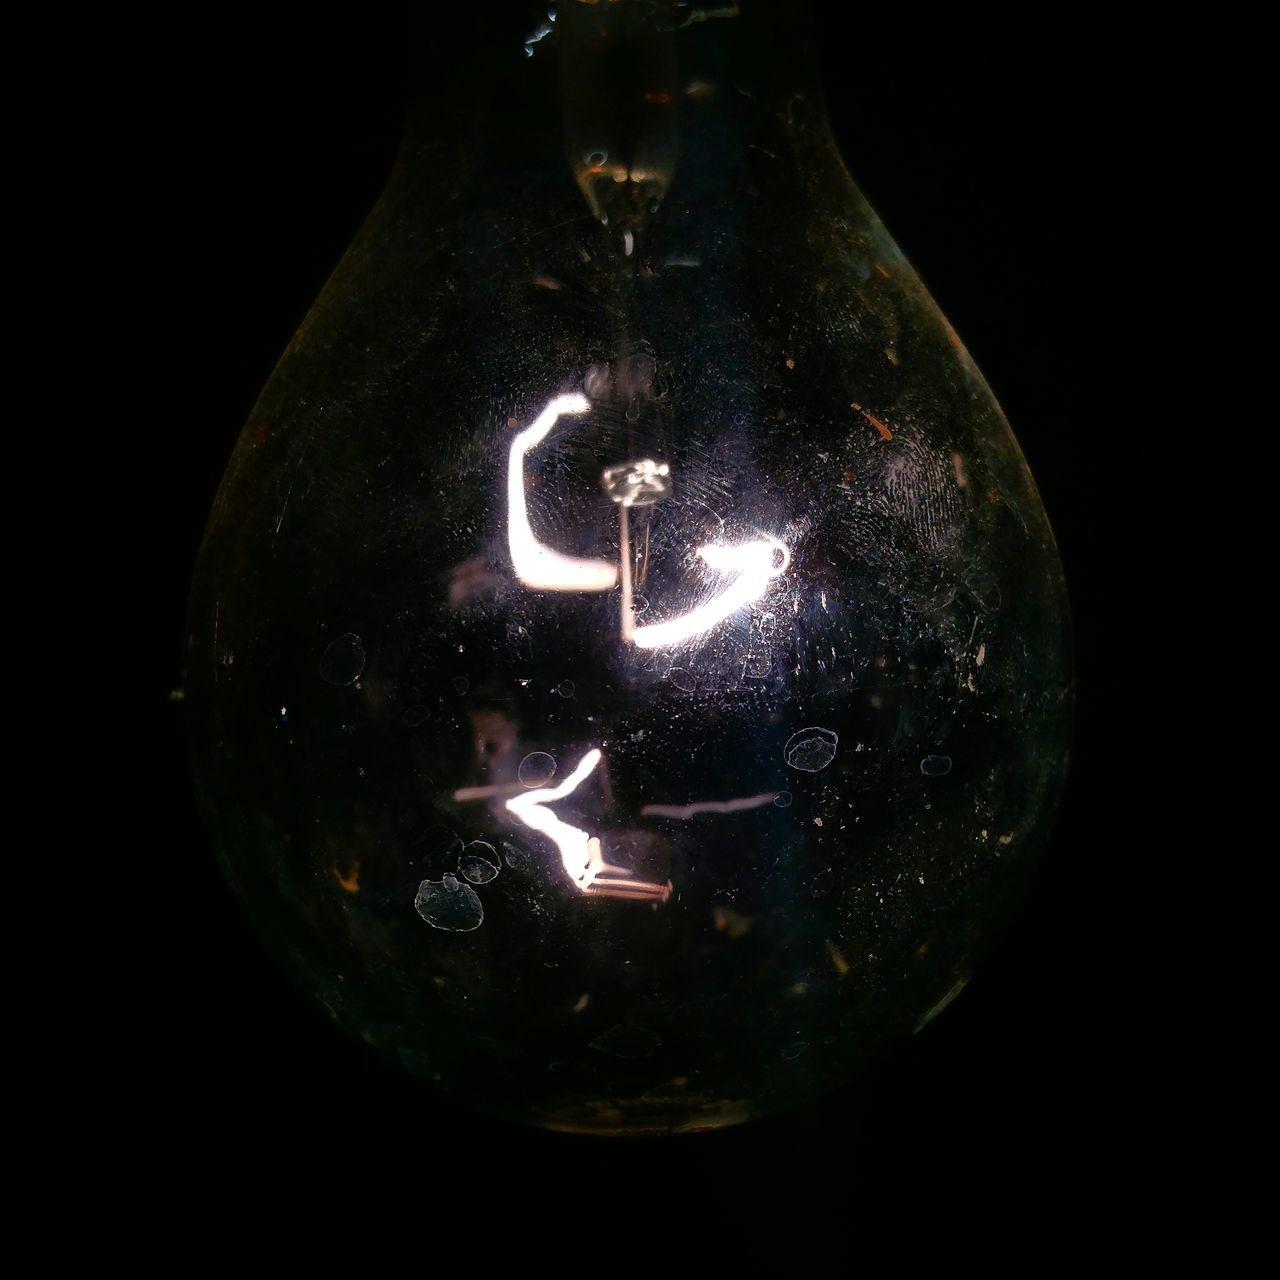 close-up, black background, illuminated, no people, lighting equipment, light bulb, studio shot, electricity, filament, indoors